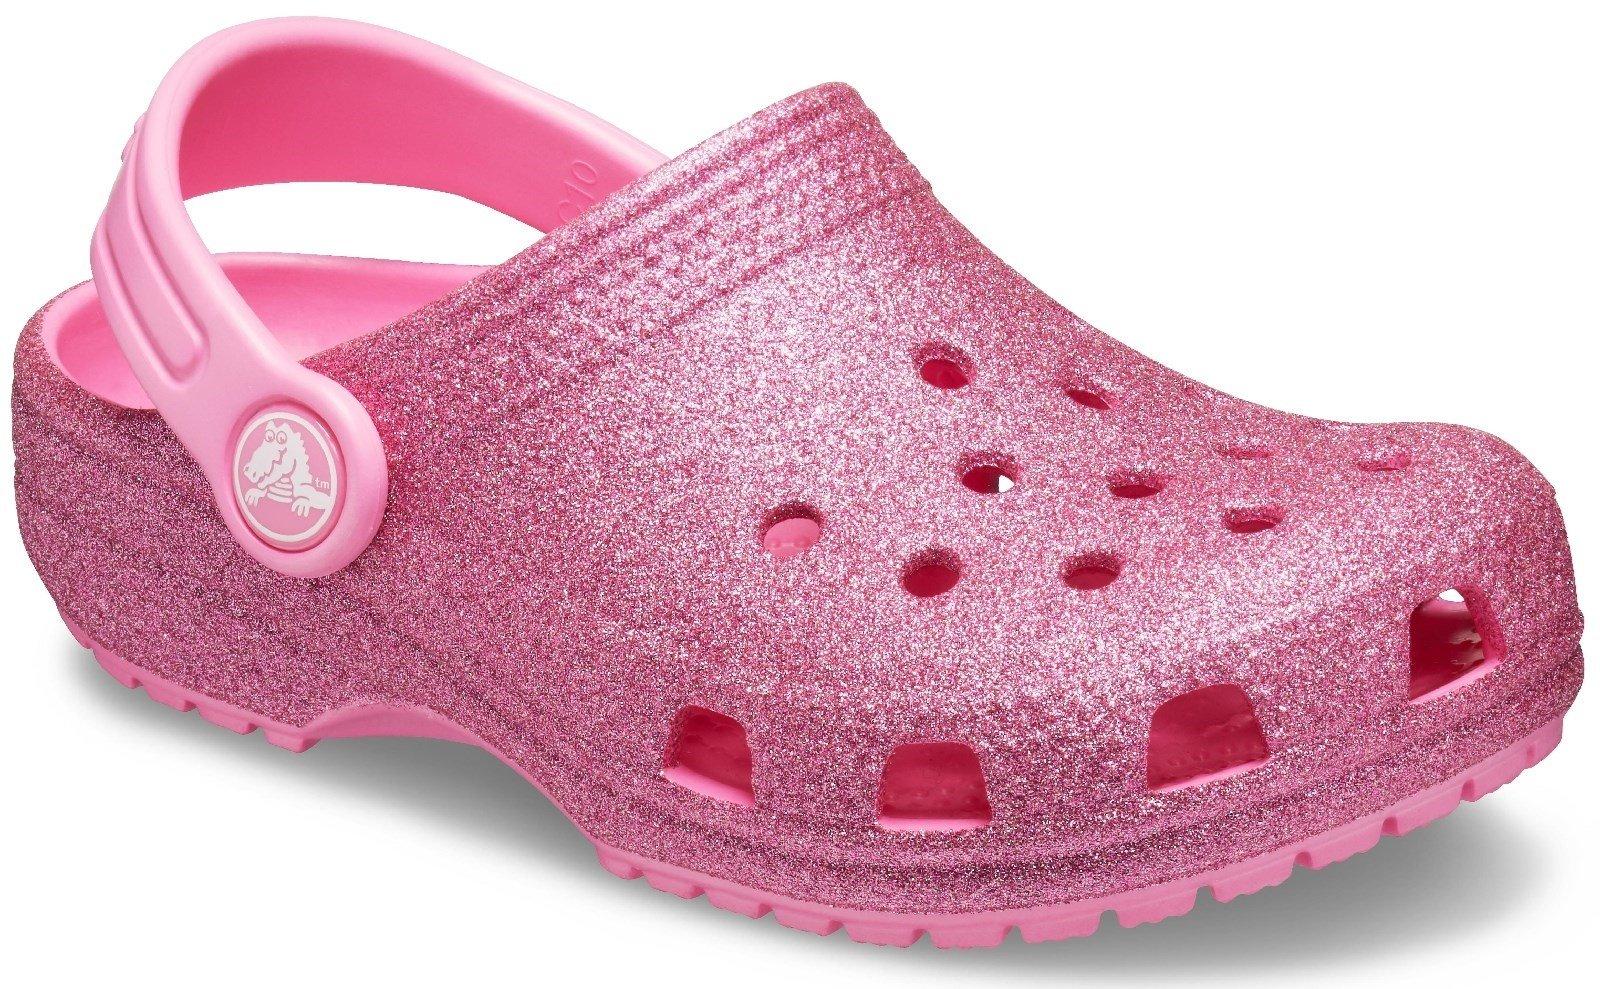 Crocs Kid's Classic Glitter Clog Slip On Sandal Pink Lemonade 27505 - Pink Lemonade 13